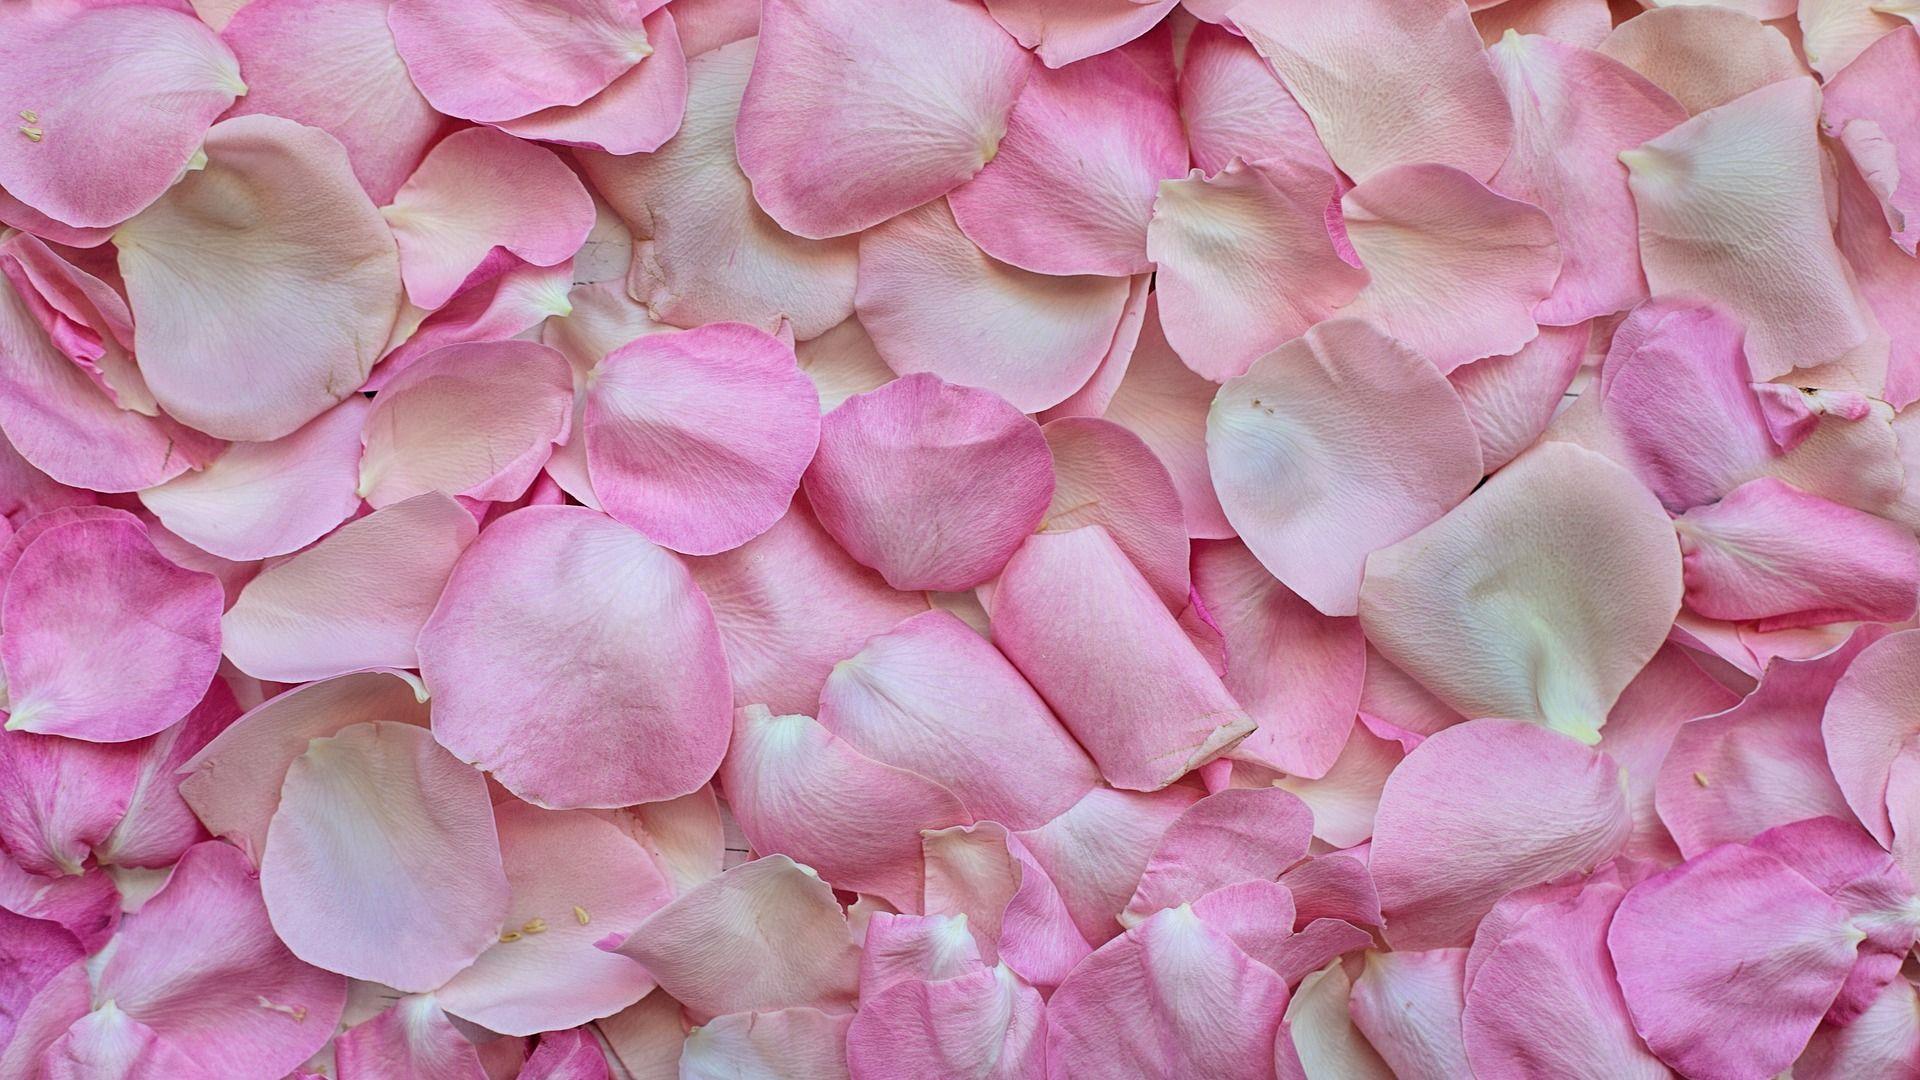 Pin On Rose Wallpaper Hd Flower petals wallpaper hd